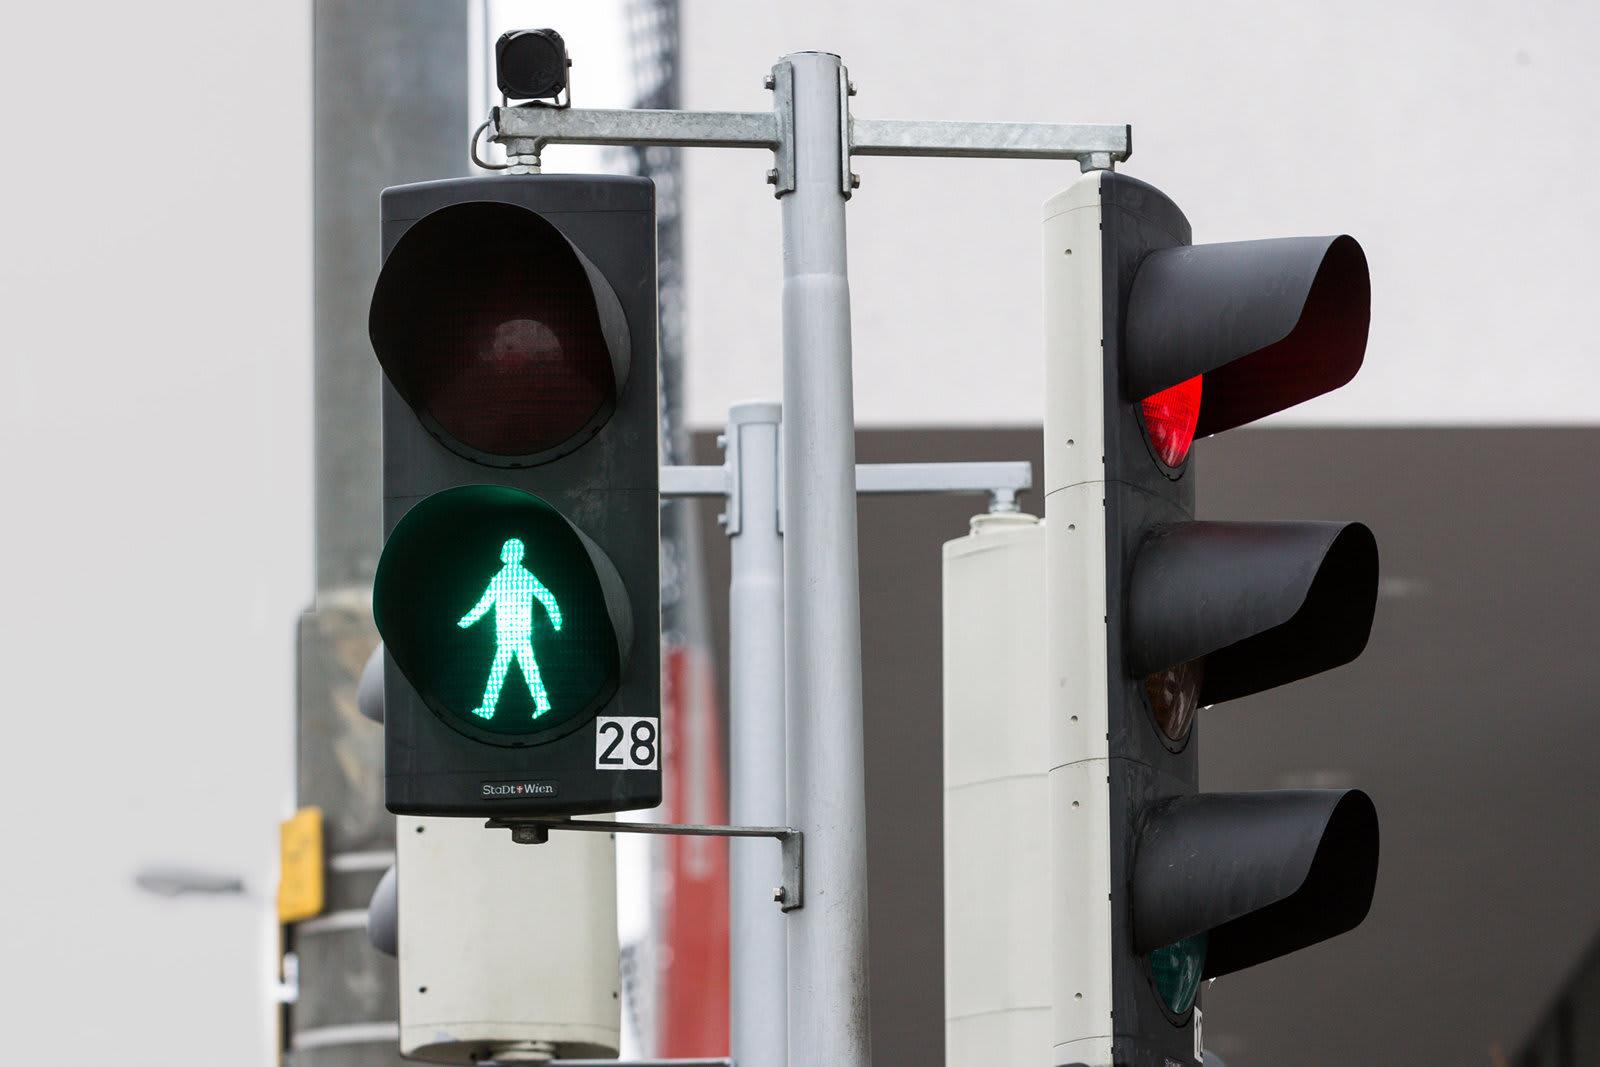 pedestrain traffic lights